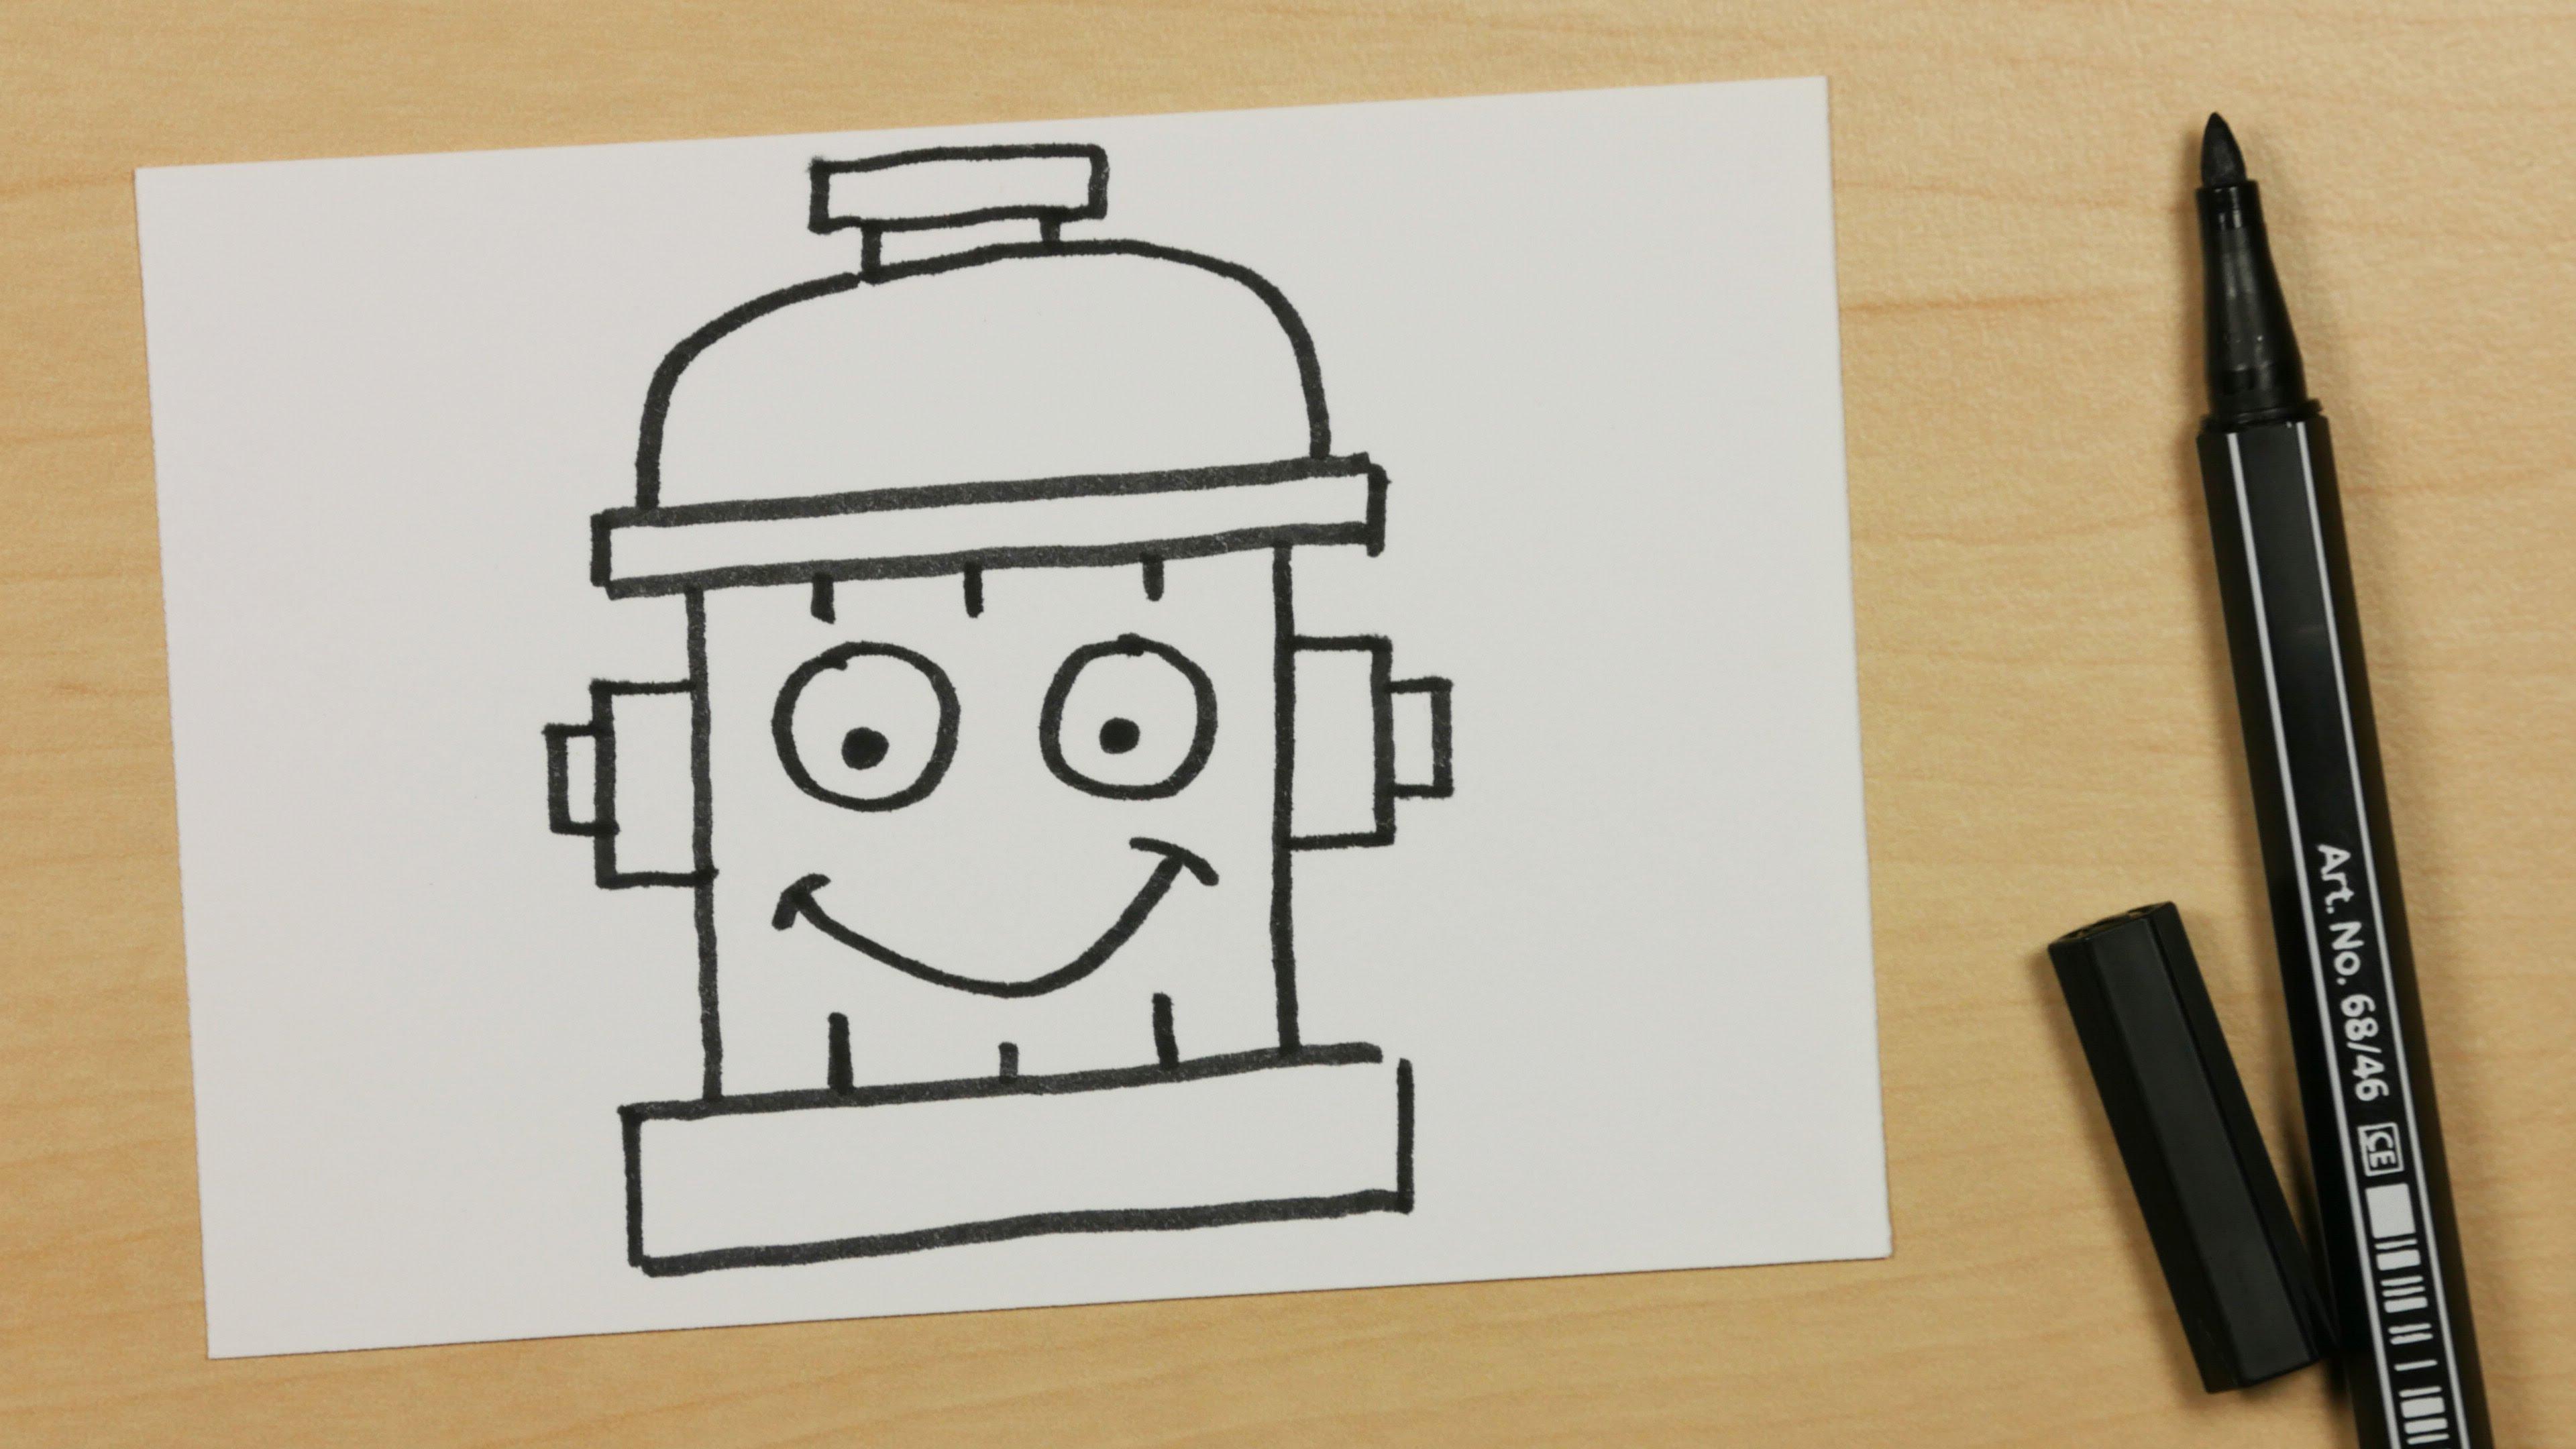 3840x2160 How To Draw A Fire Hydrant Or Fireplug